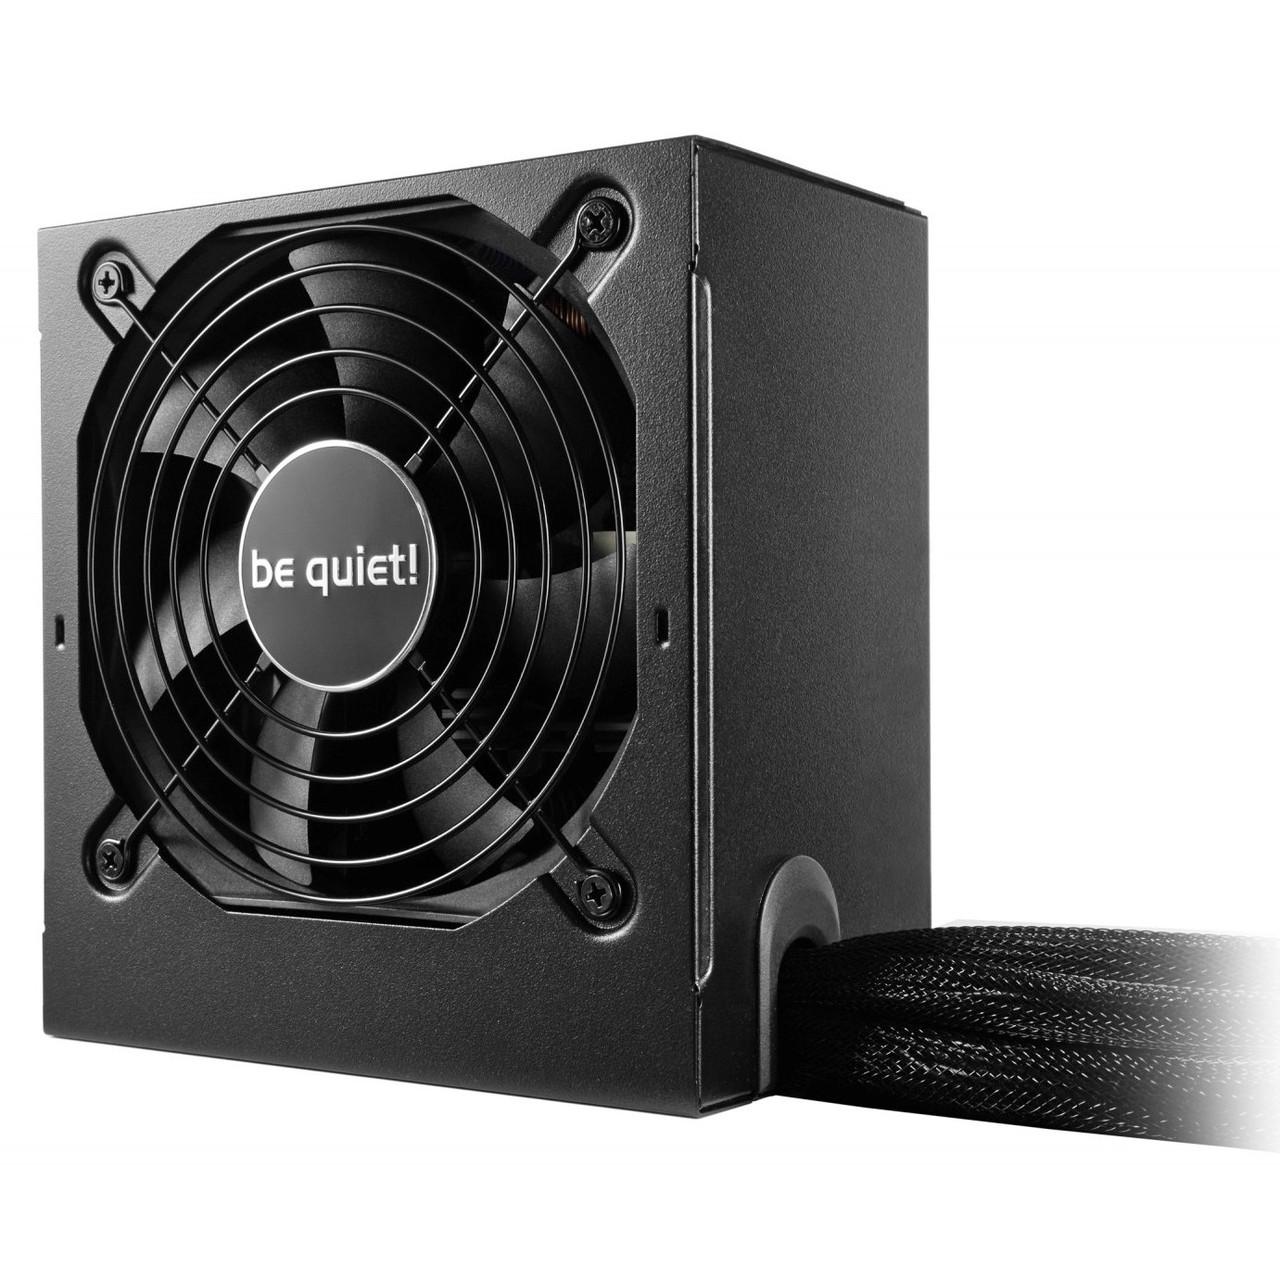 Блок питания be quiet! Pure Power 9 500W (BN246)